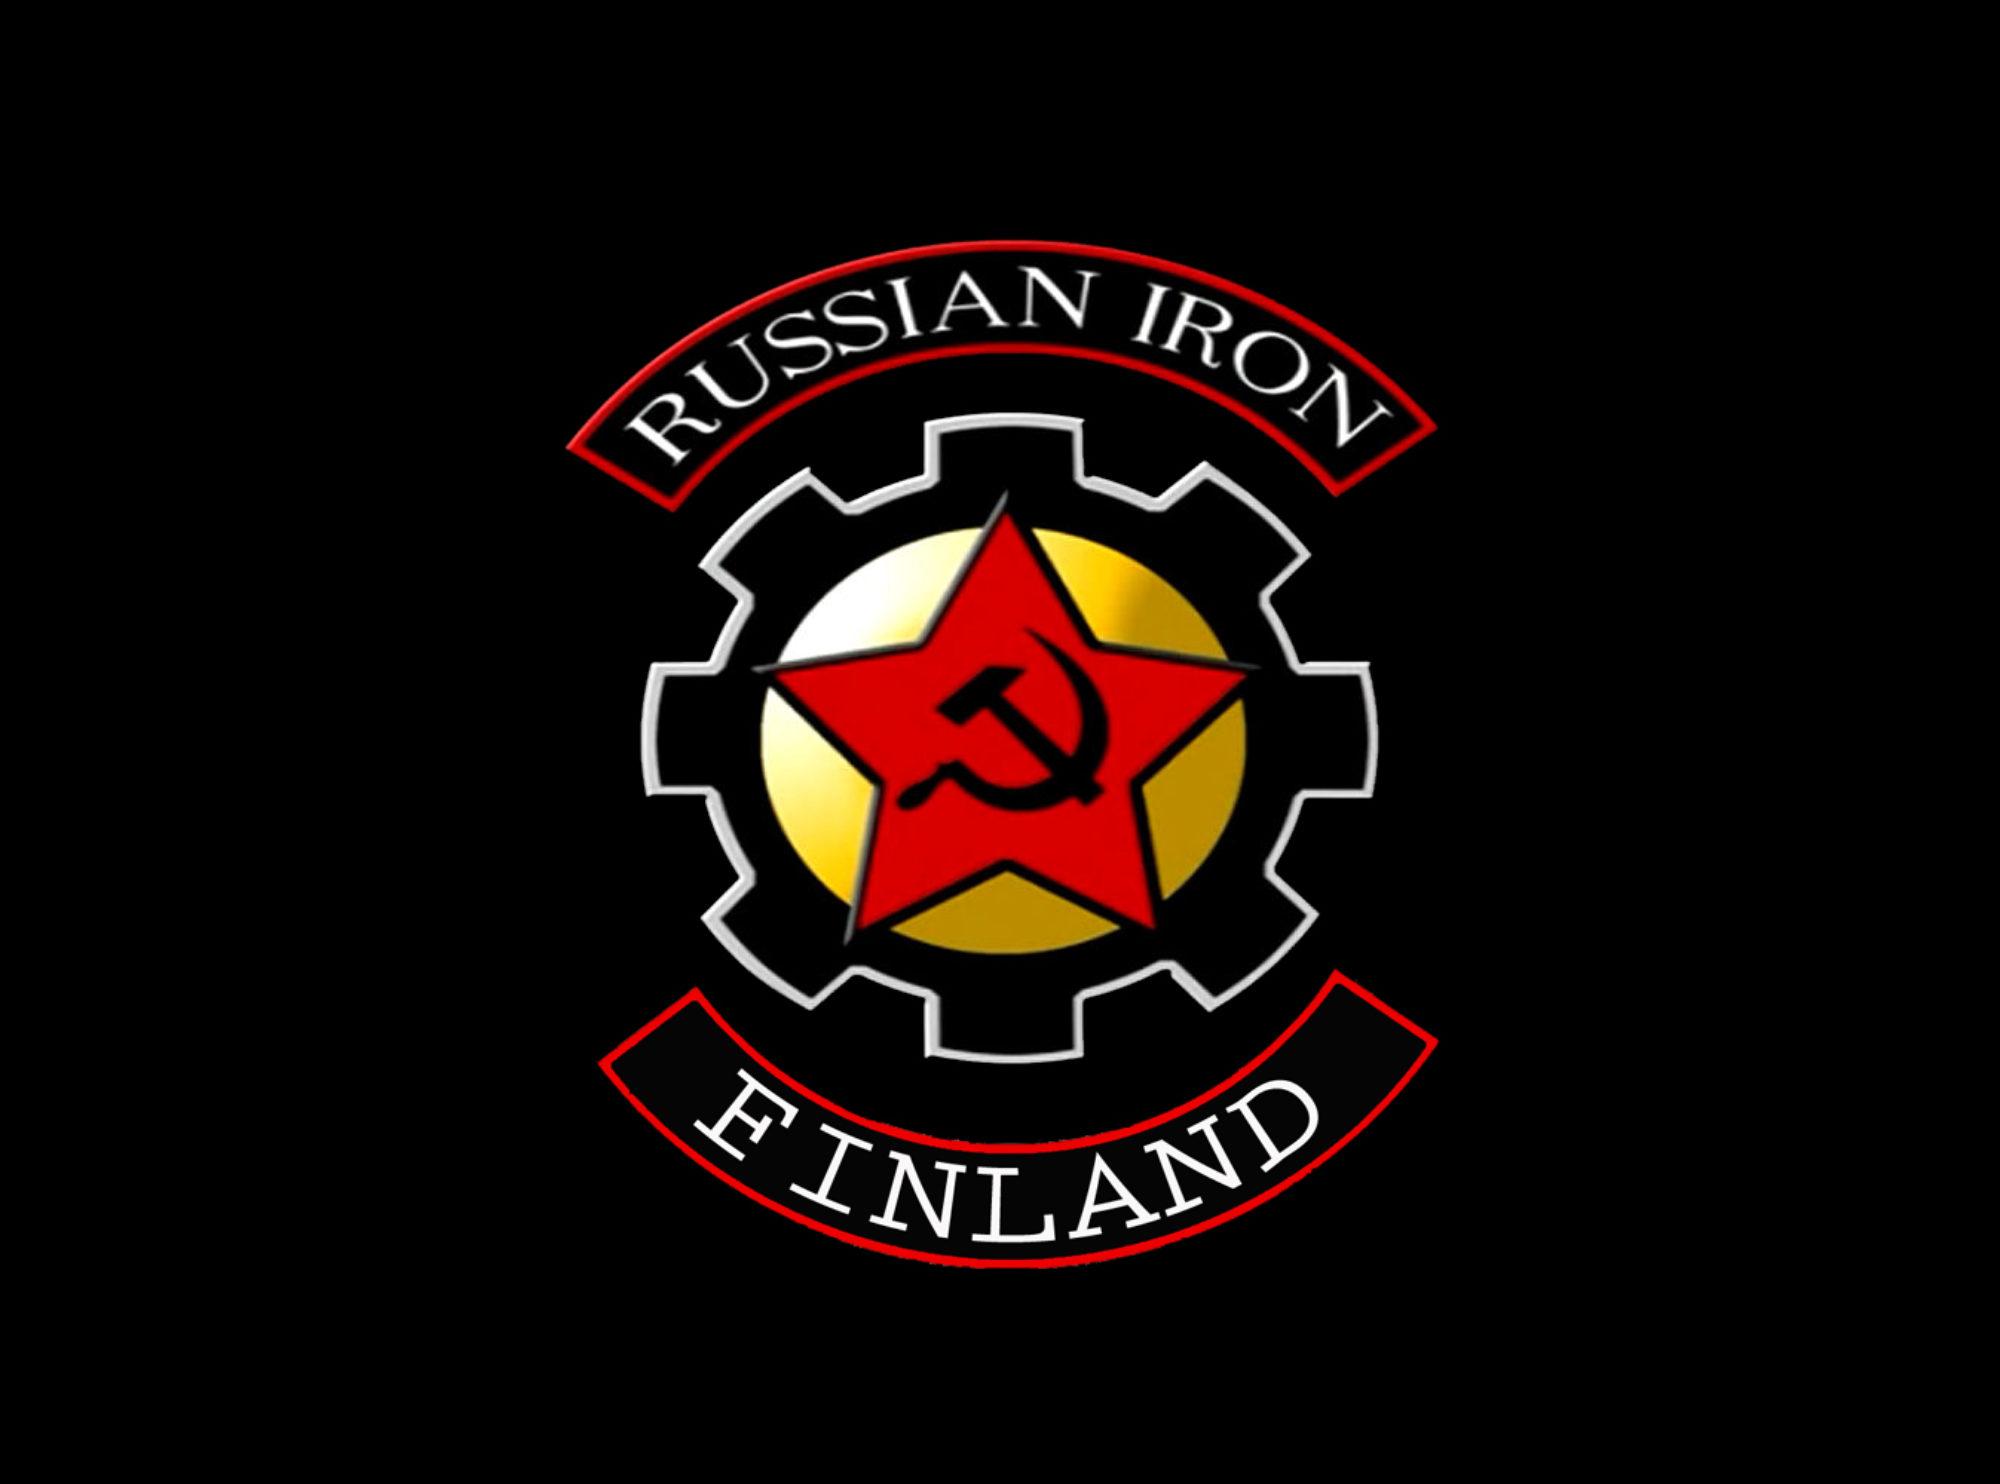 Russian Iron Finland